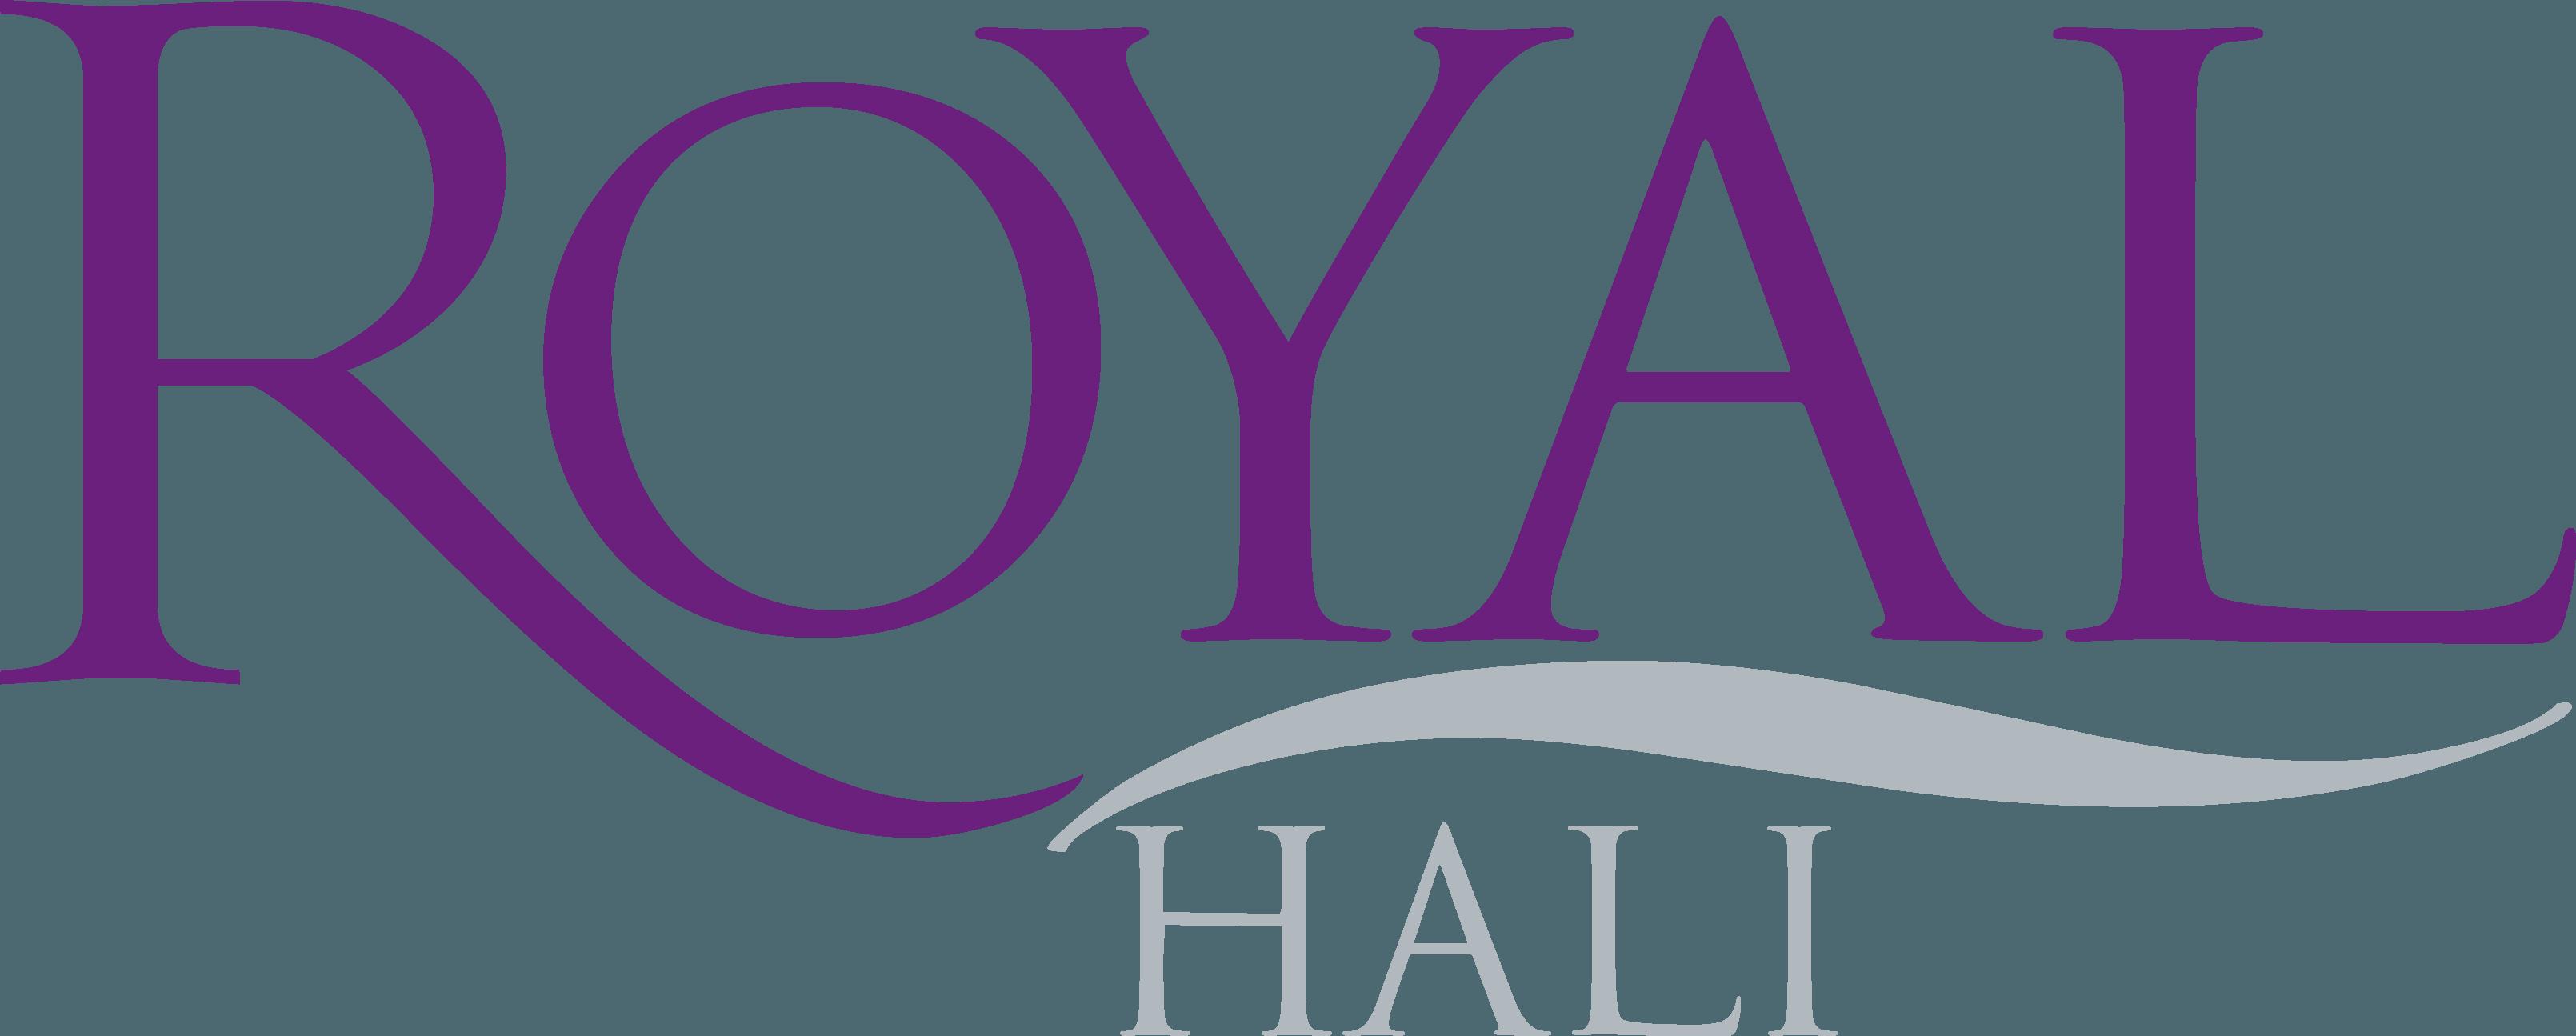 Royal Halı Logo png